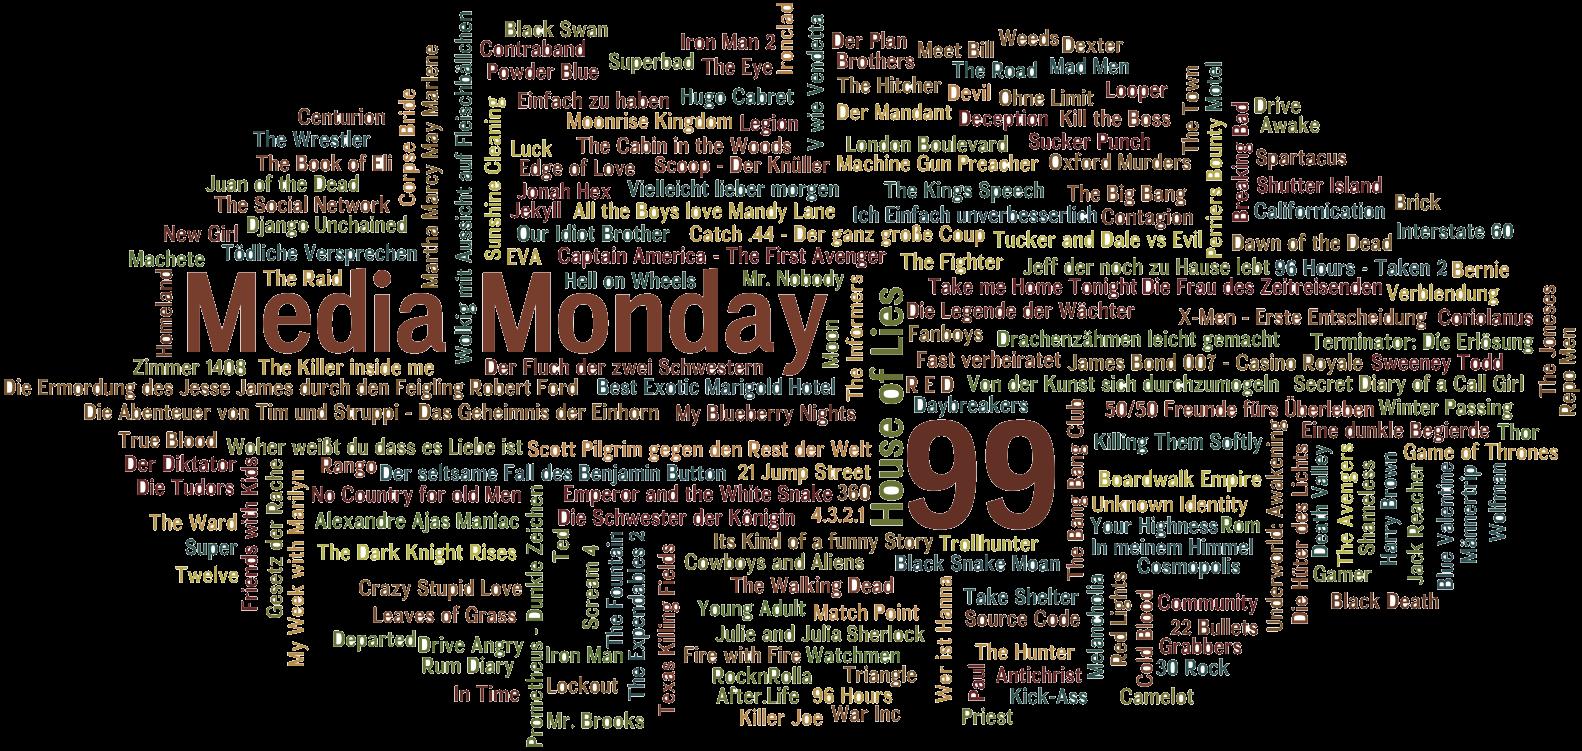 Media Monday 99